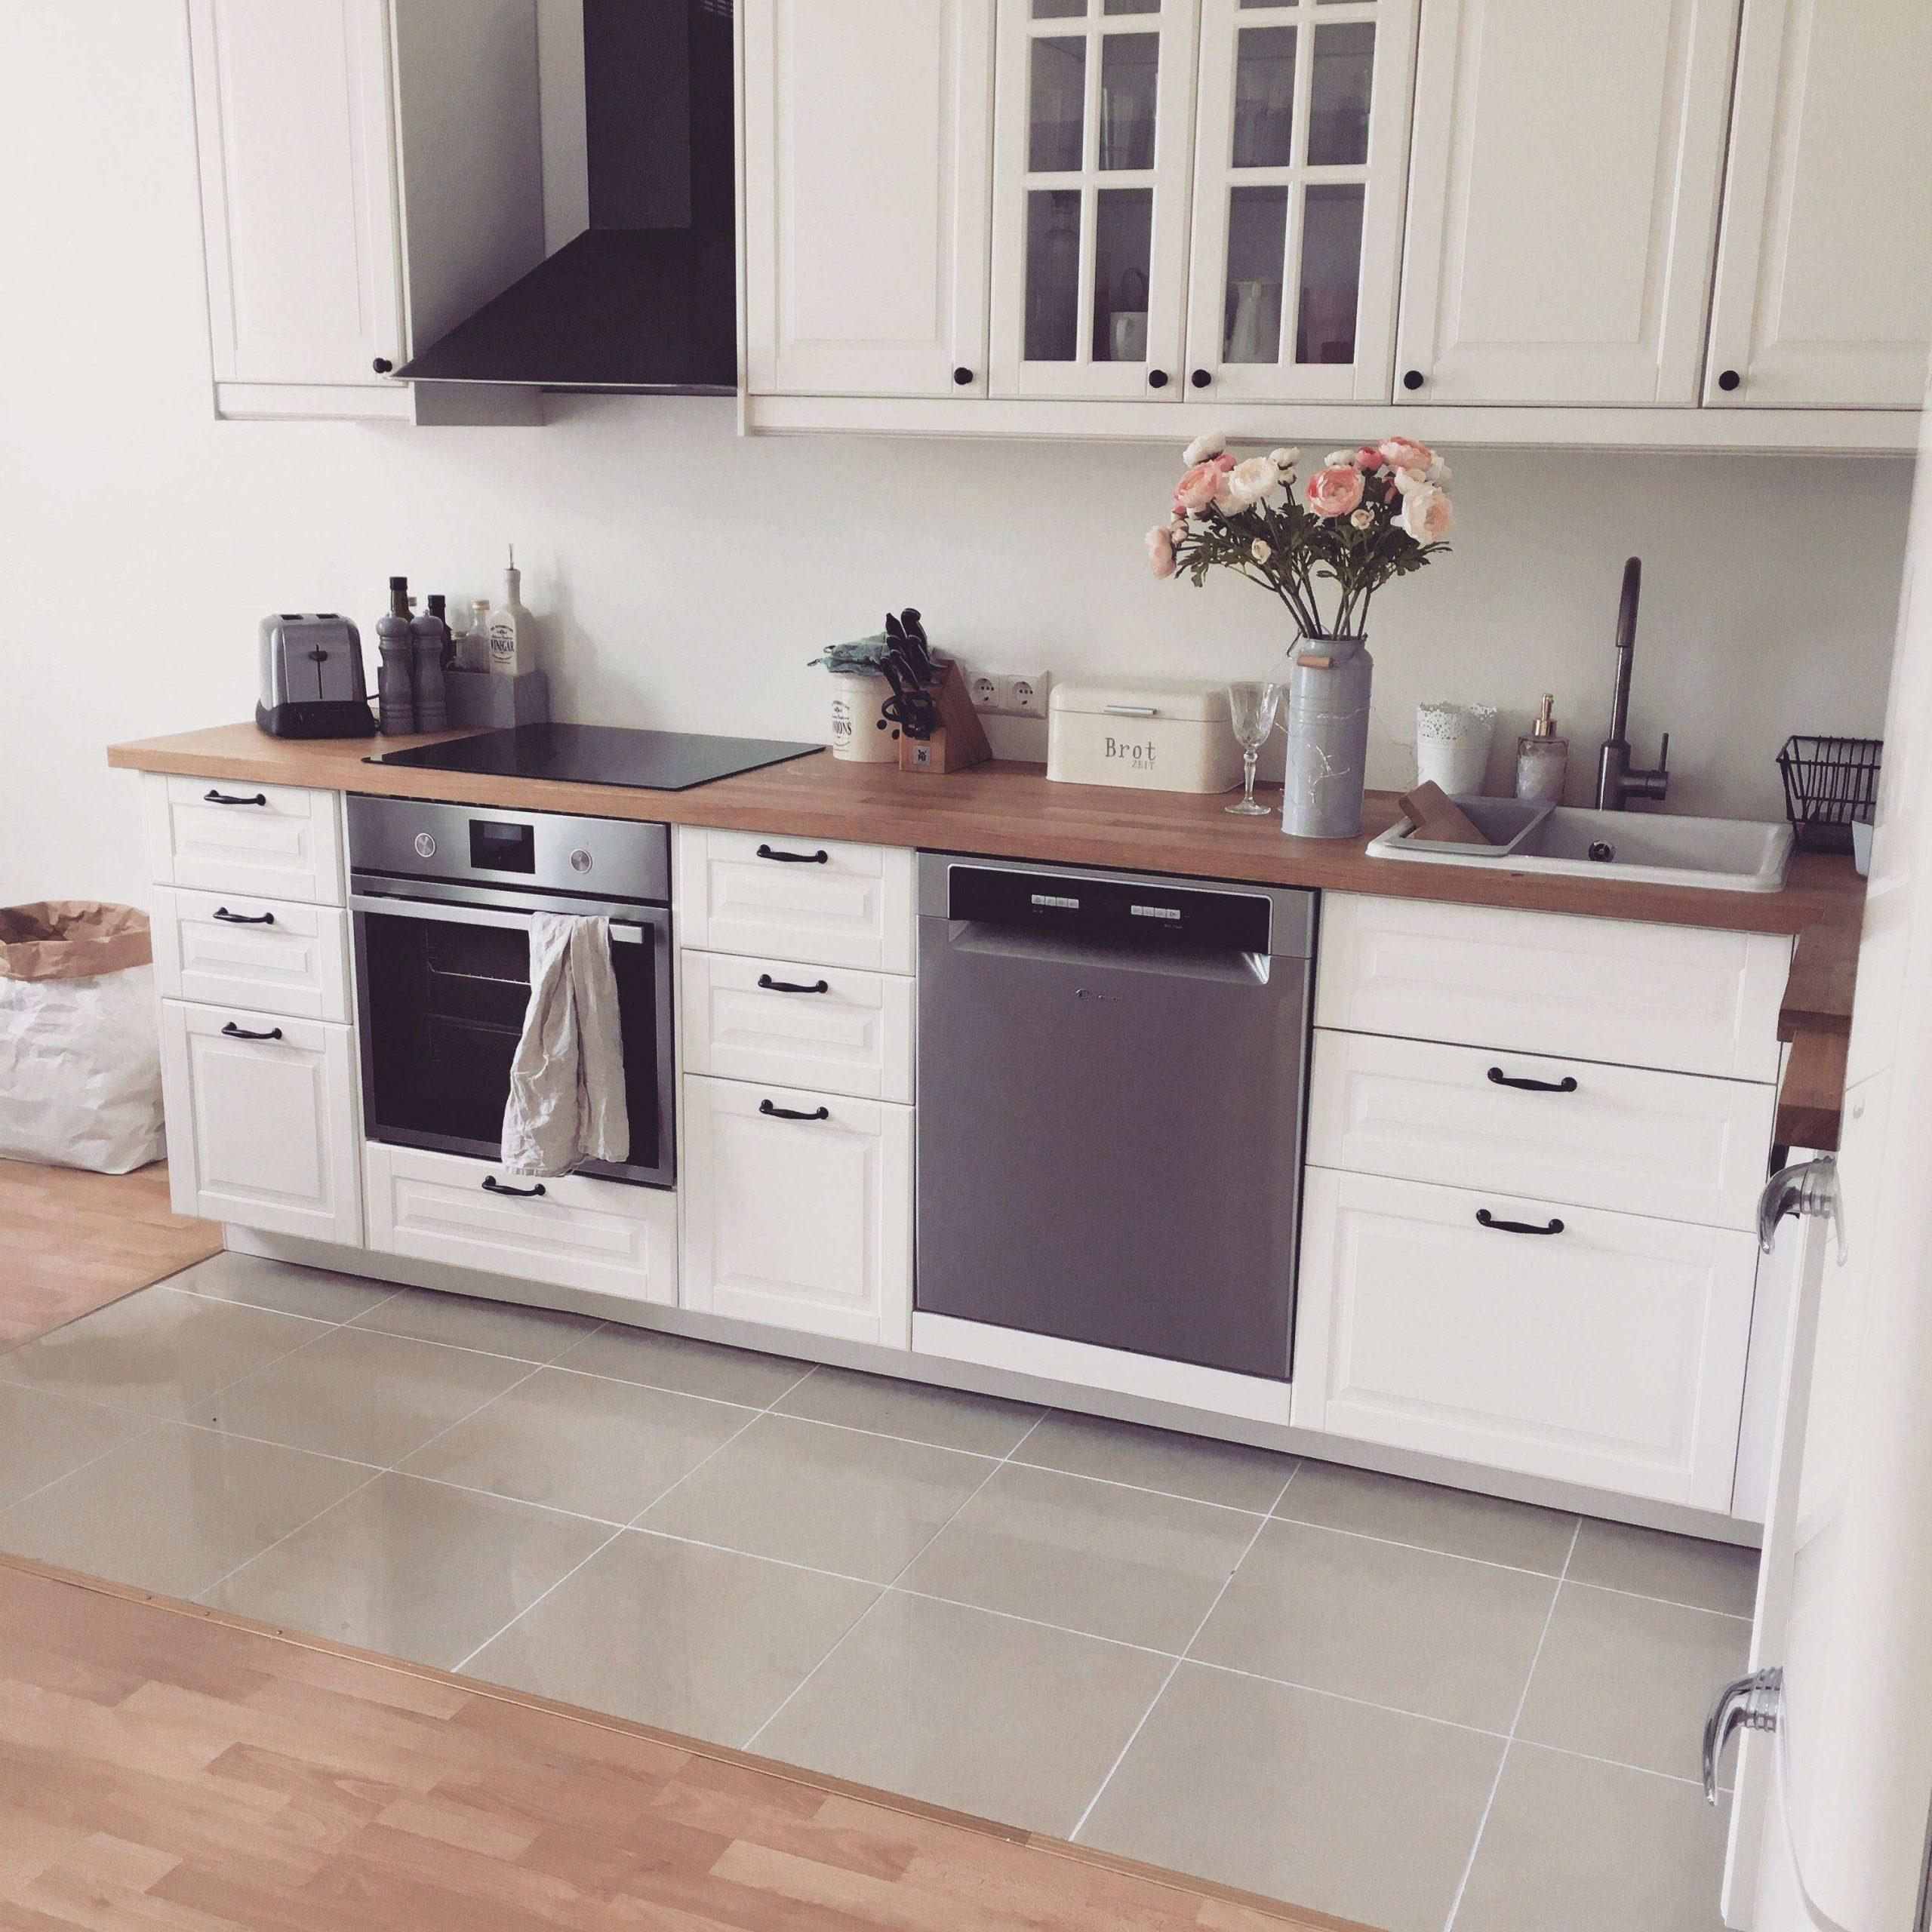 Full Size of Roller Komplettküche Kleine Komplettküche Günstige Komplettküche Komplettküche Angebot Küche Komplettküche